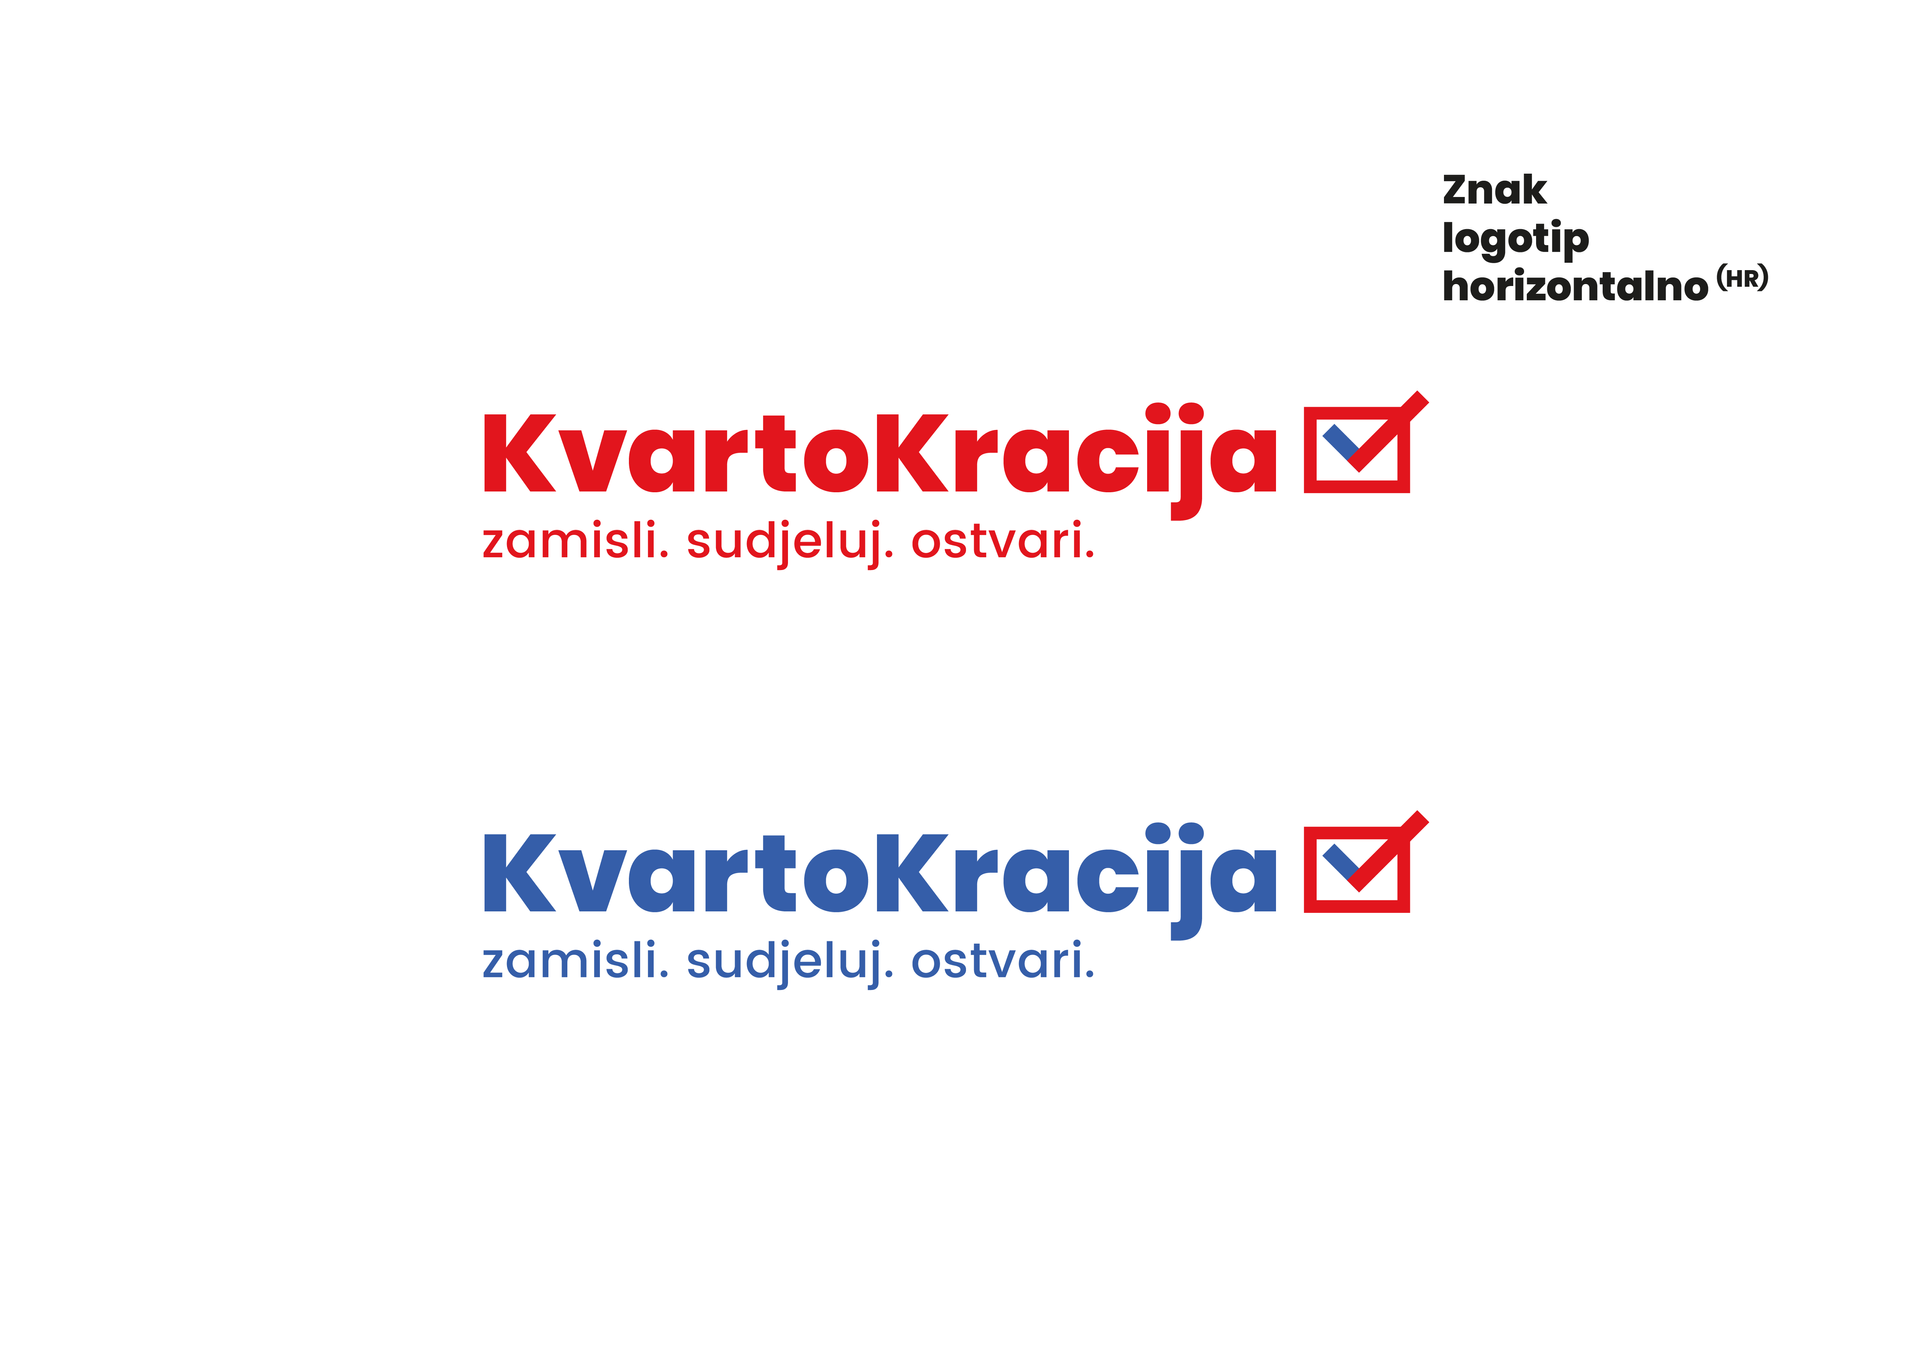 KVARTOKRACIJA_PREZENTACIJA_FINAL-16.png